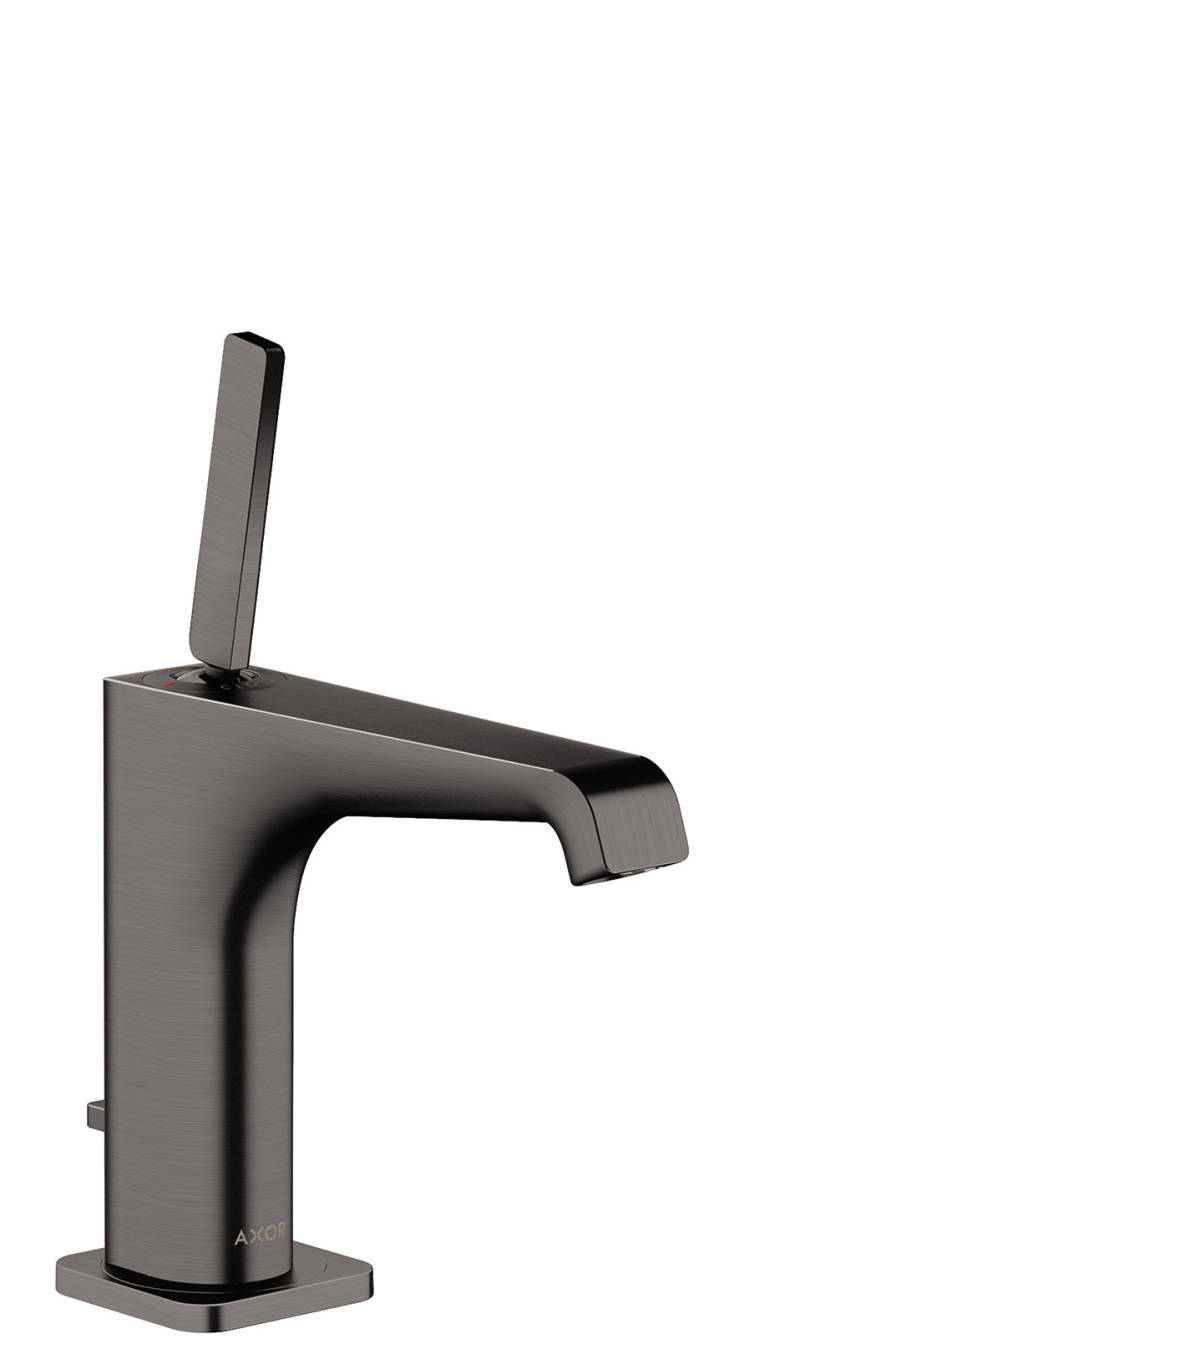 Single lever basin mixer 130 with pop-up waste set, Brushed Black Chrome, 36100340